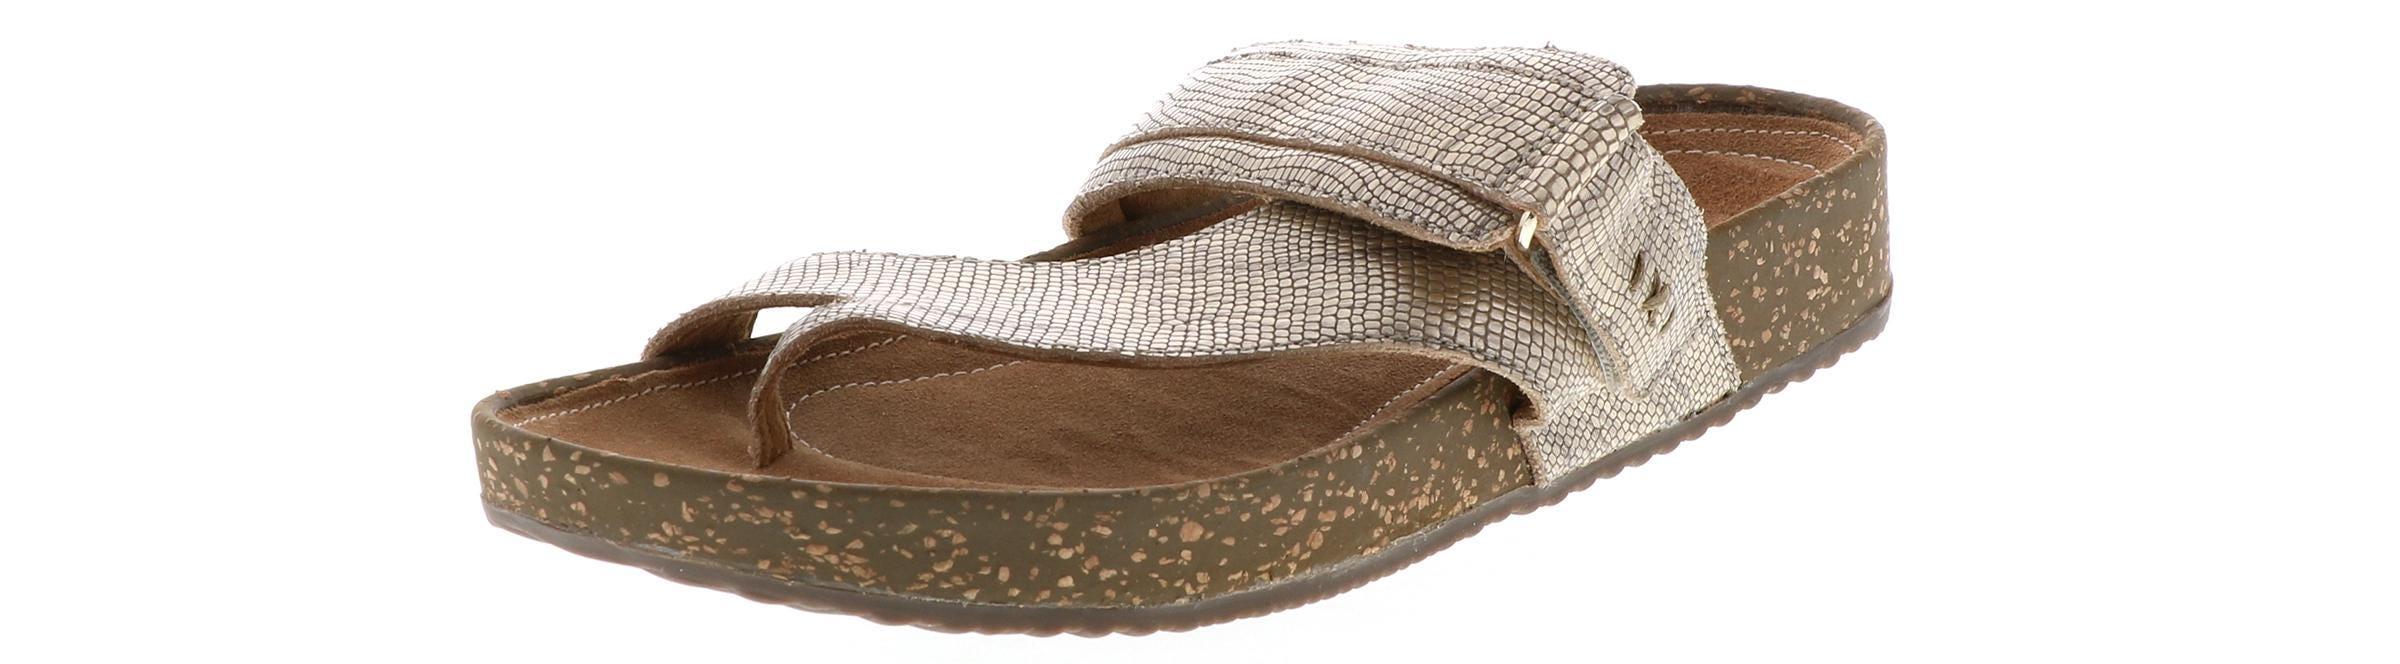 Clarks Rosilla Durham Women's Sandal